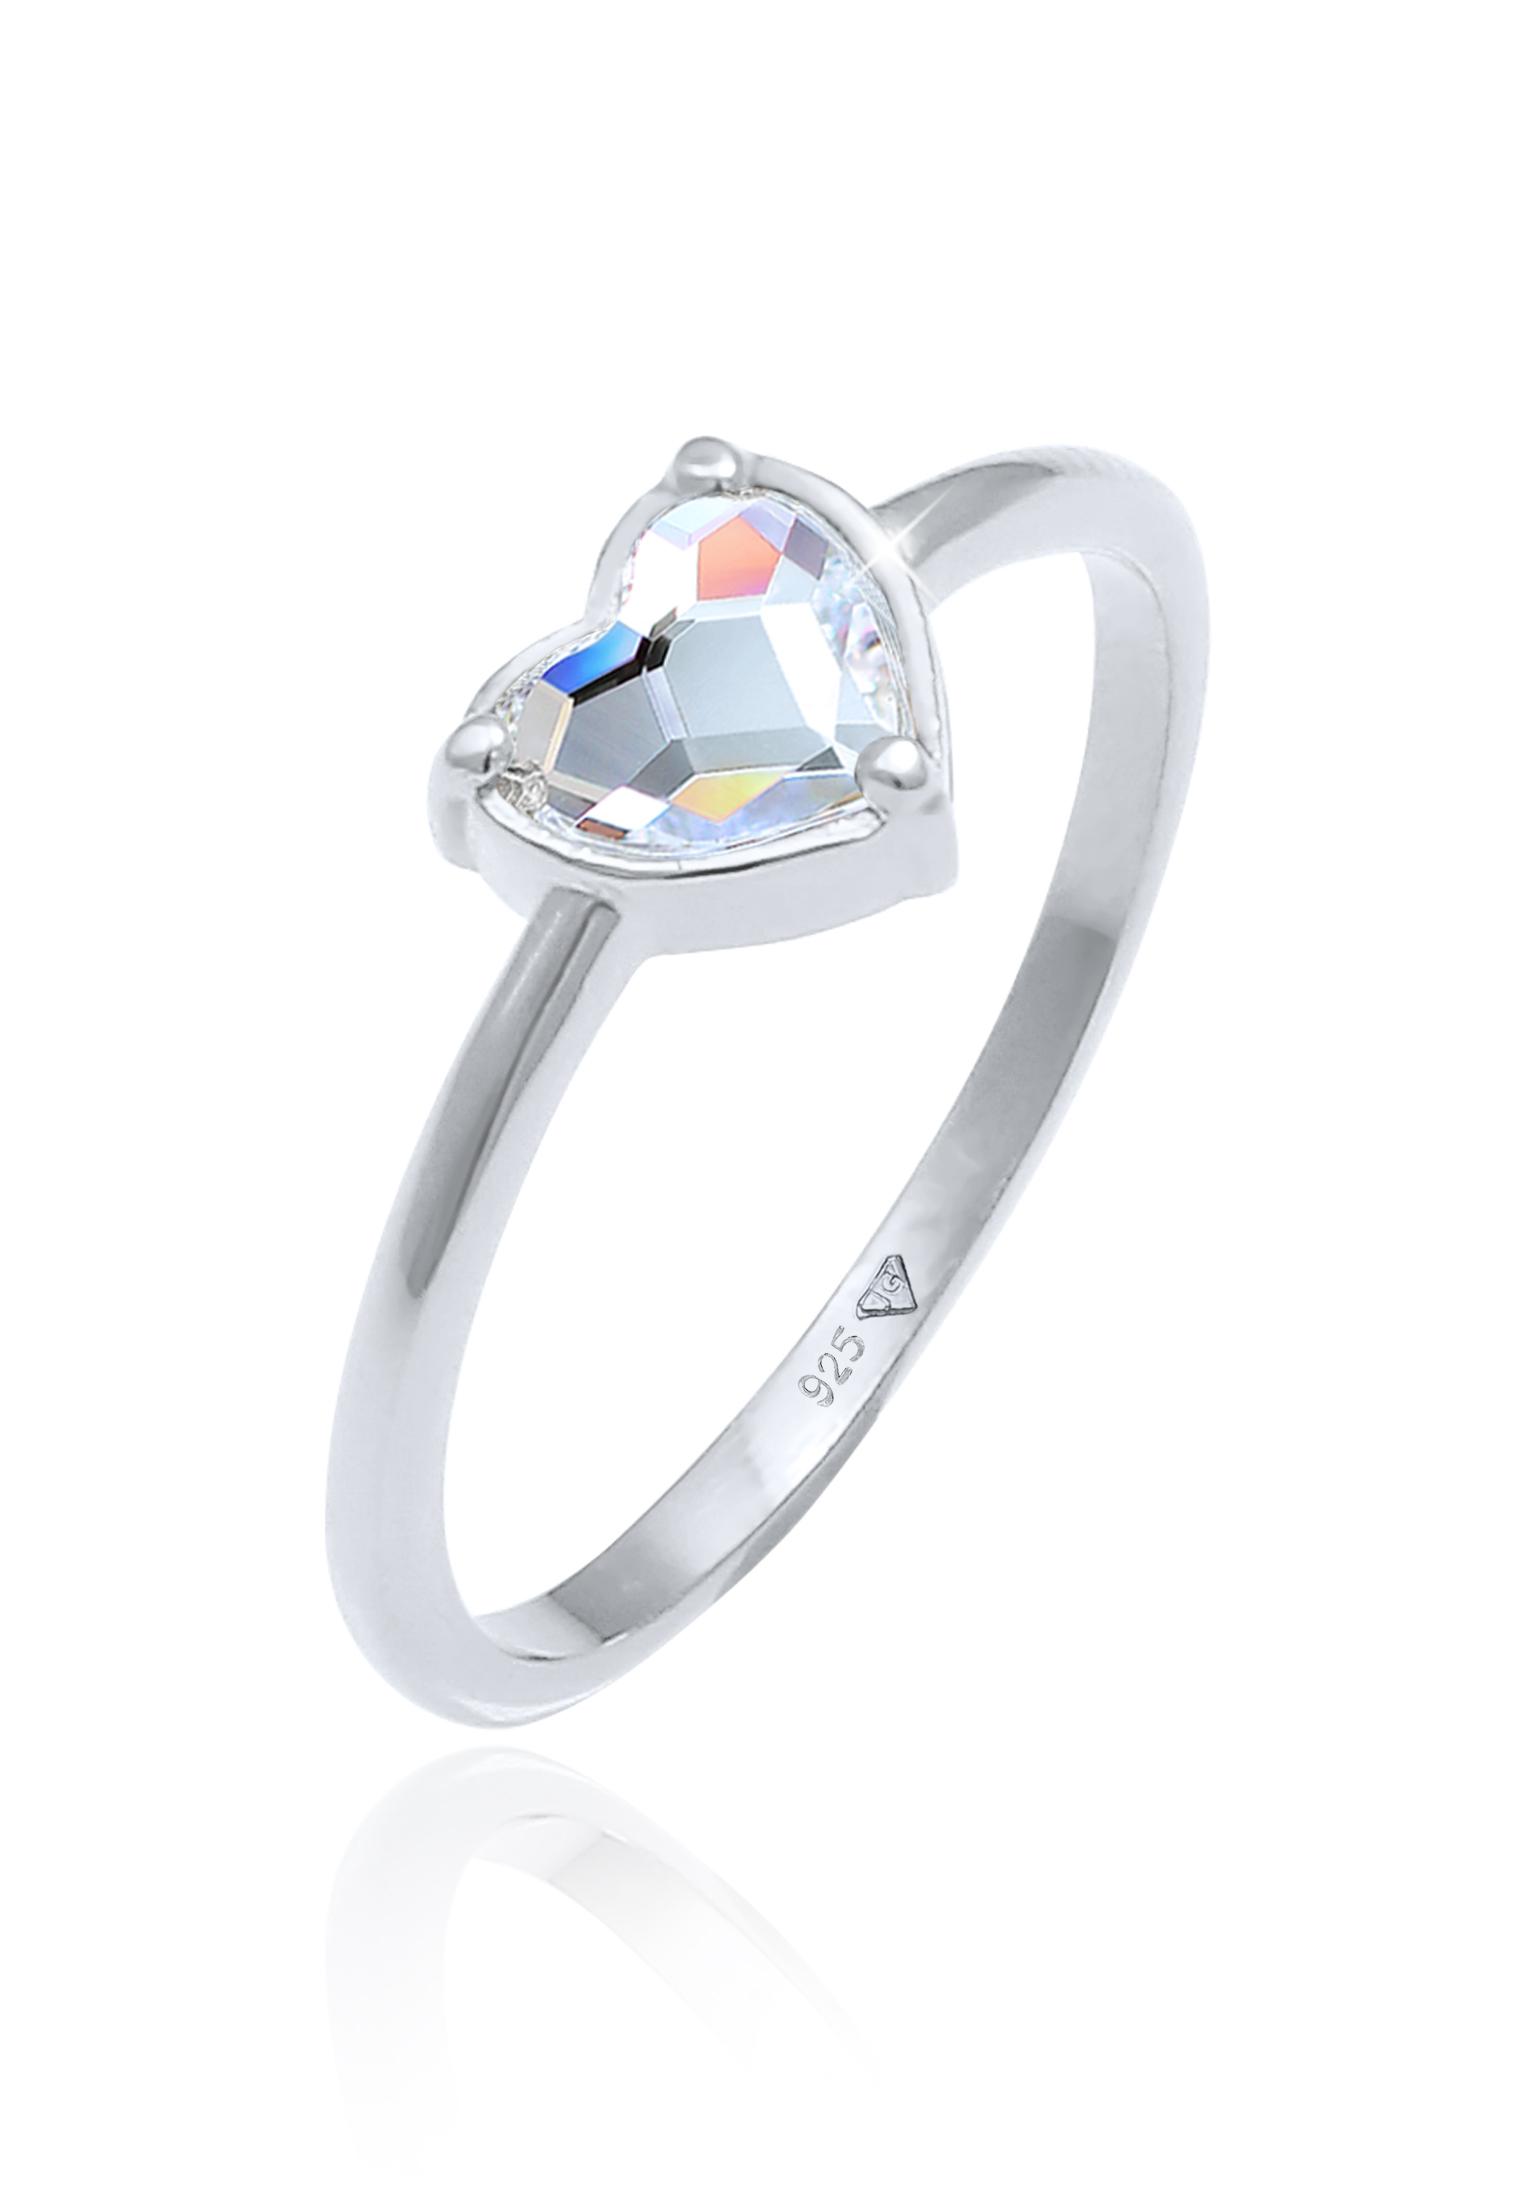 Ring Herz   Kristall ( Weiß )   925er Sterling Silber